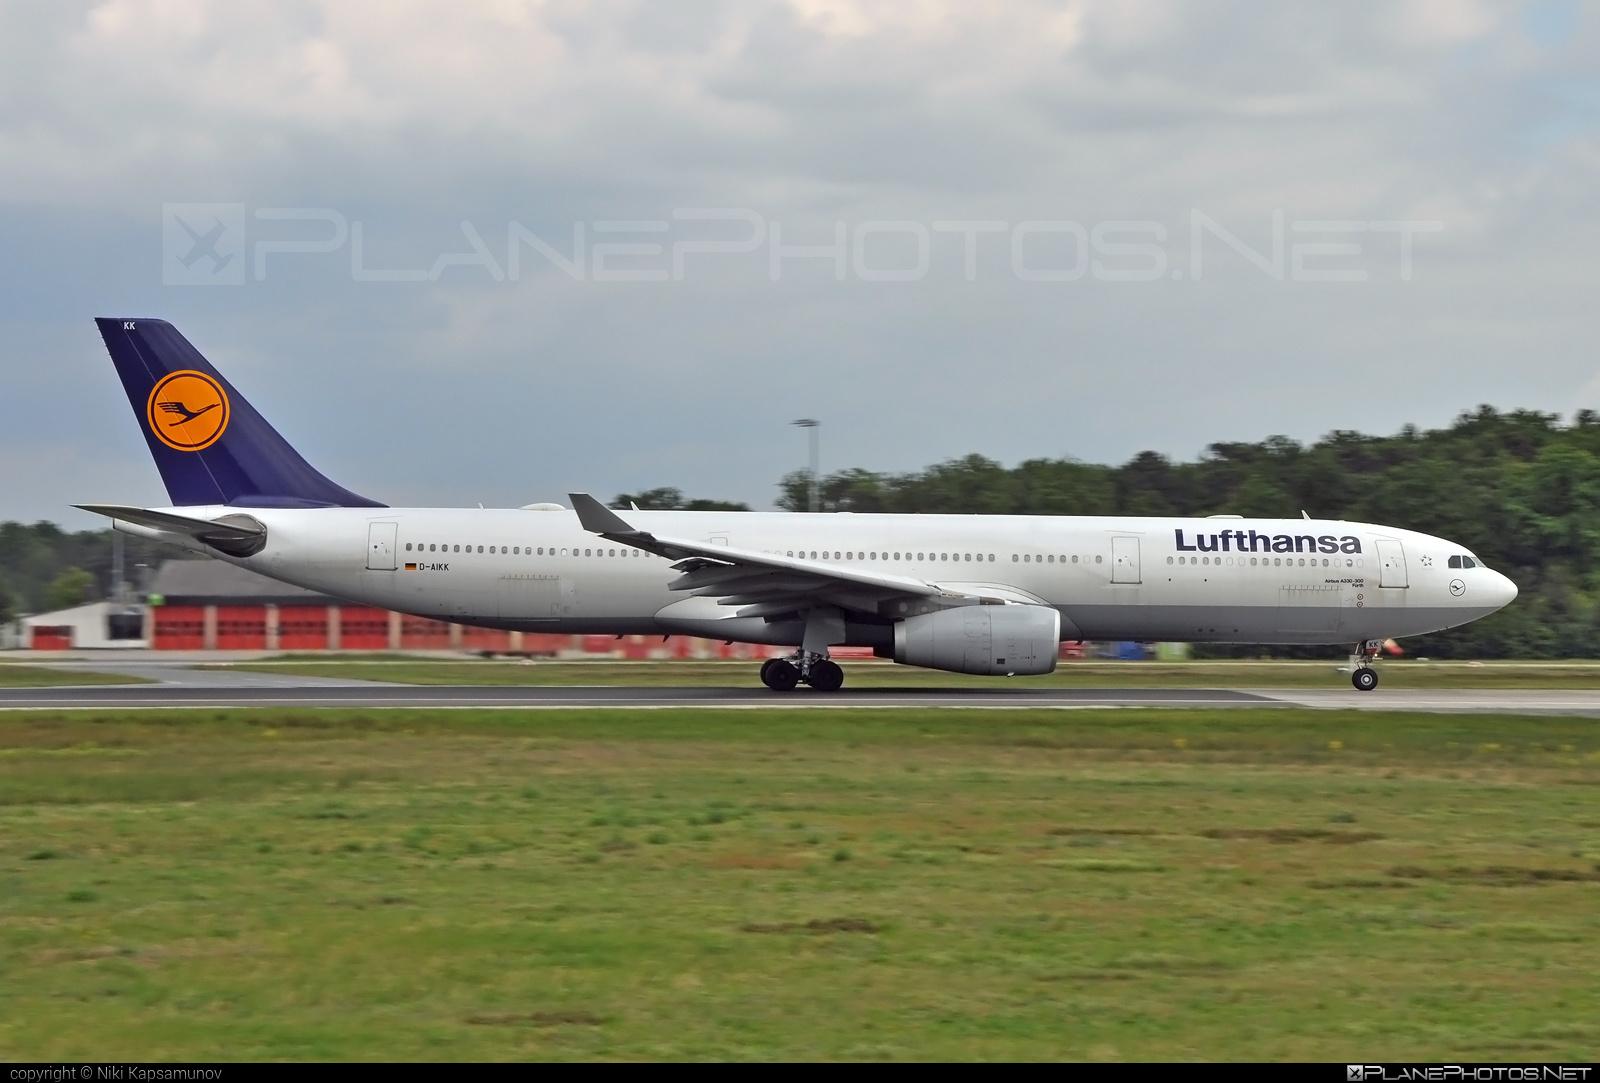 Airbus A330-343 - D-AIKK operated by Lufthansa #a330 #a330family #airbus #airbus330 #lufthansa